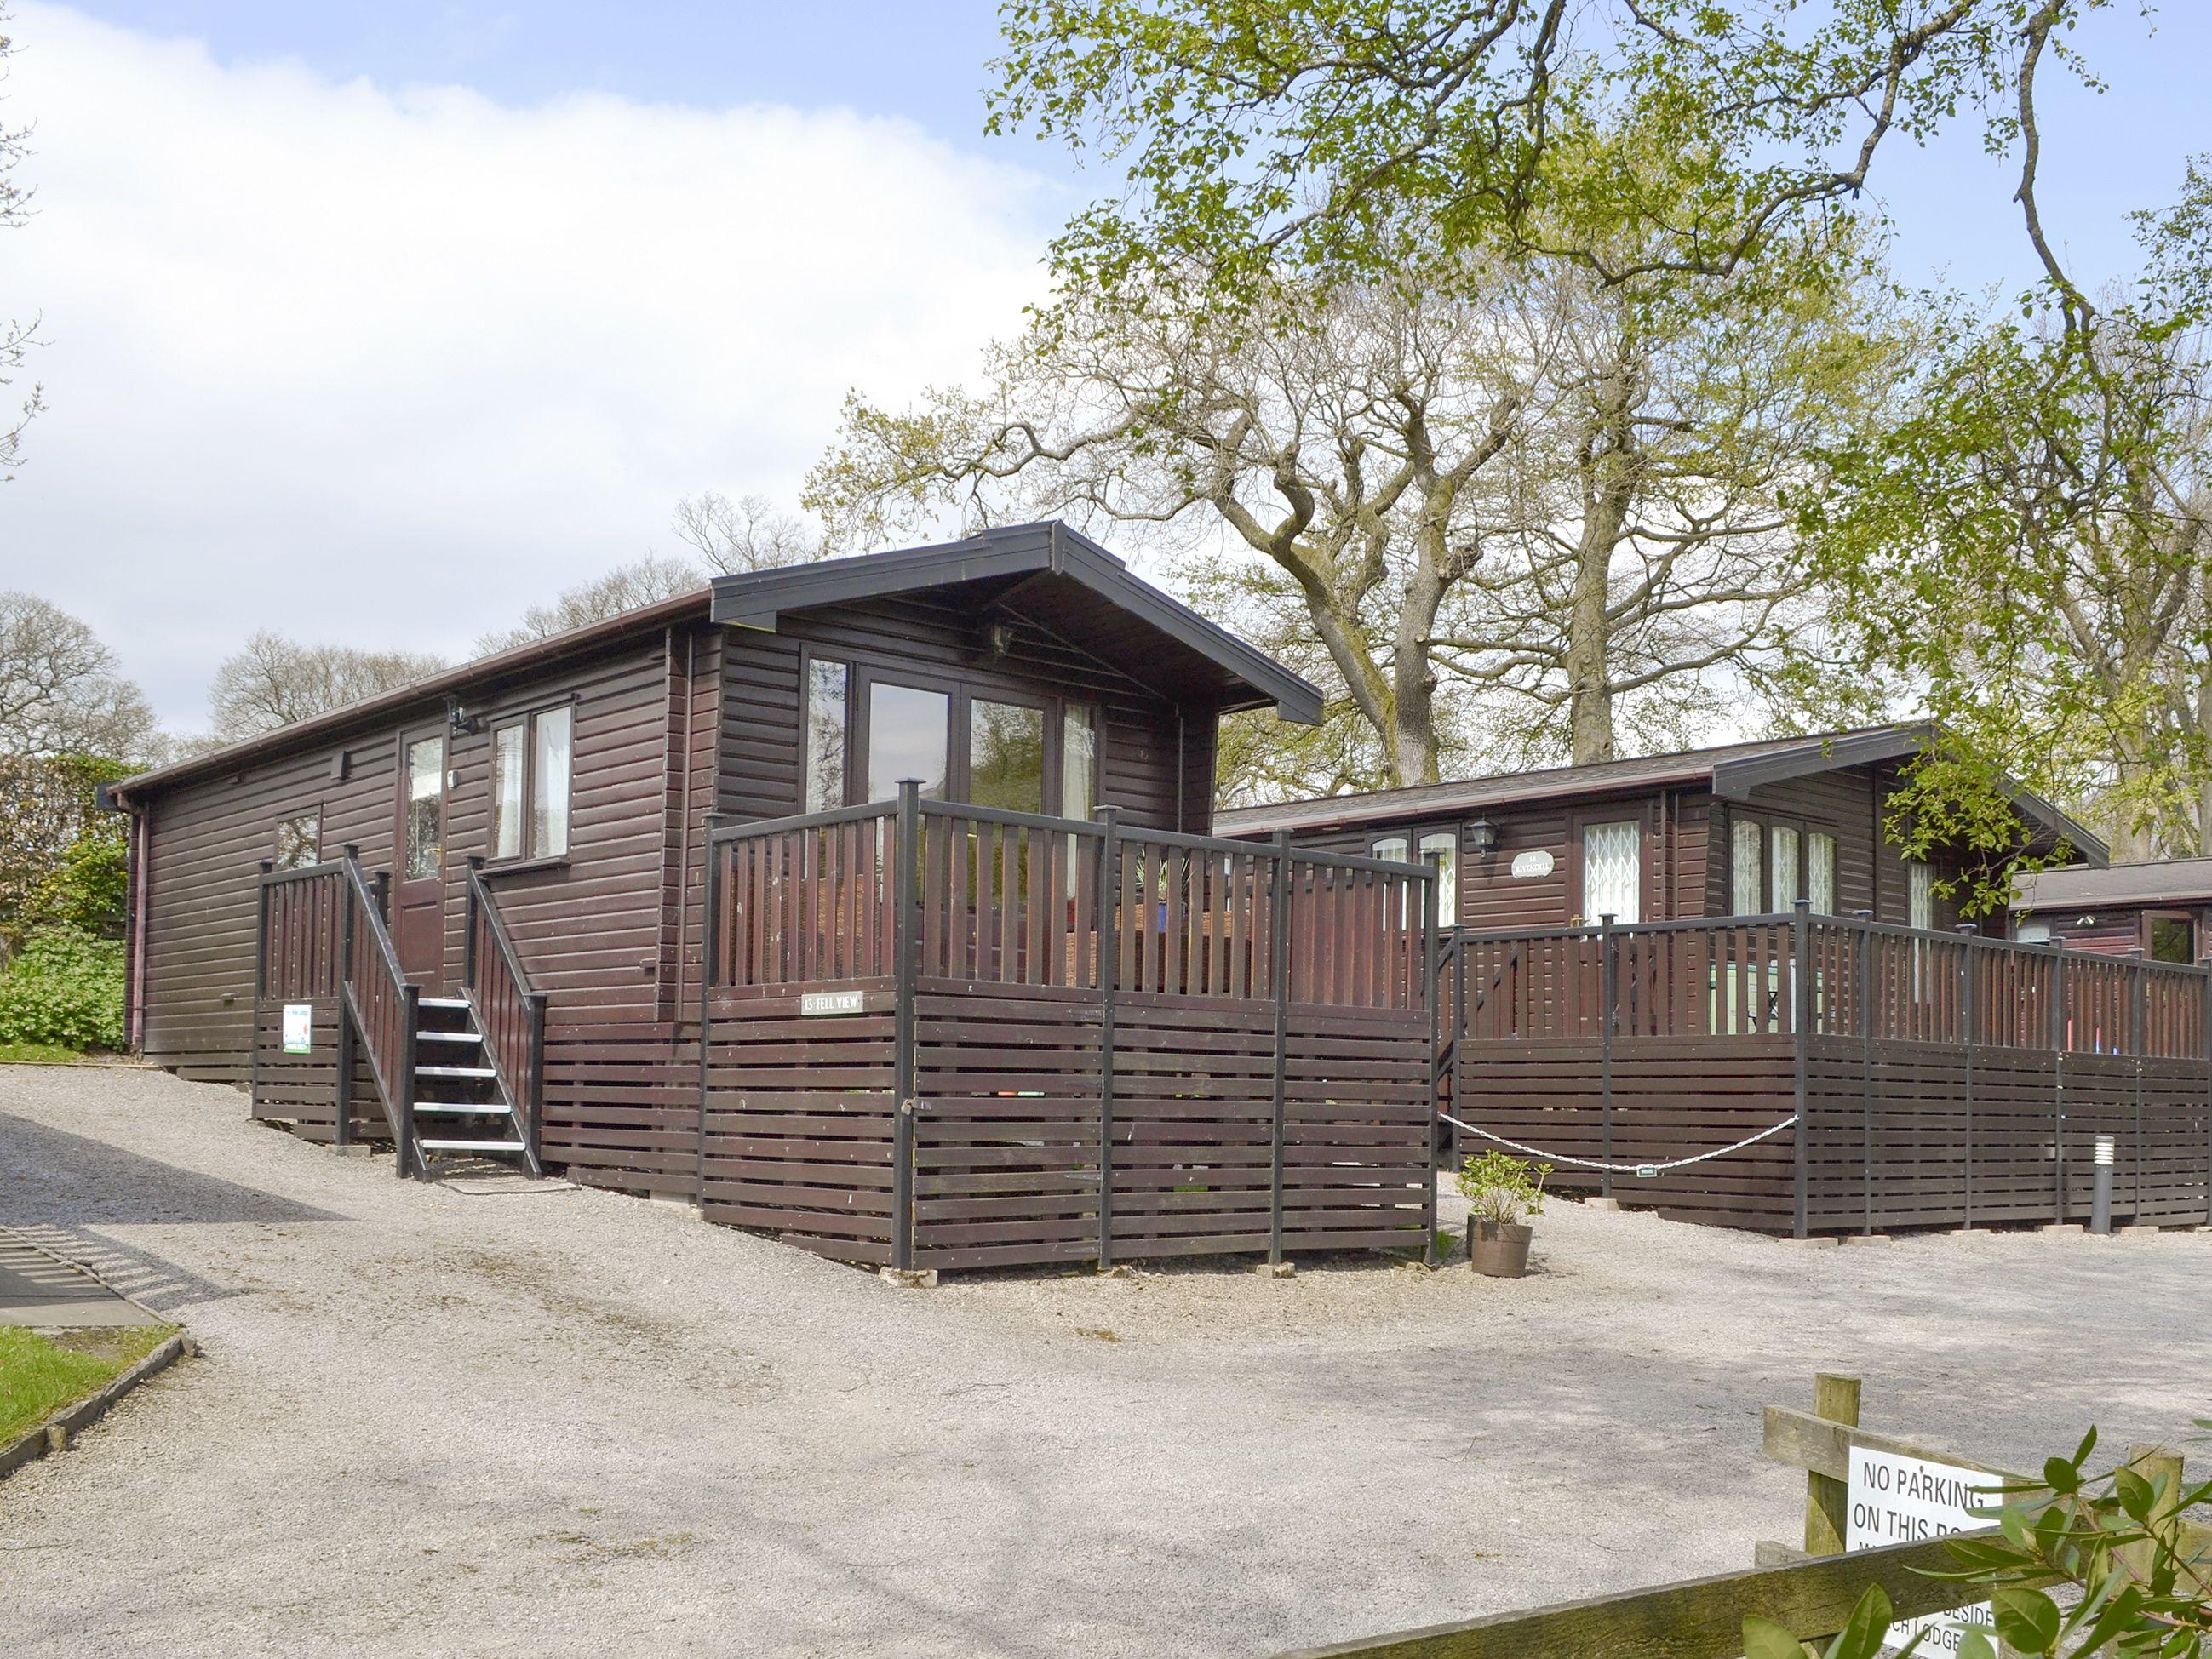 Fell View Lodge Burnside Park Ref Cc111168 In Keswick Cumbria